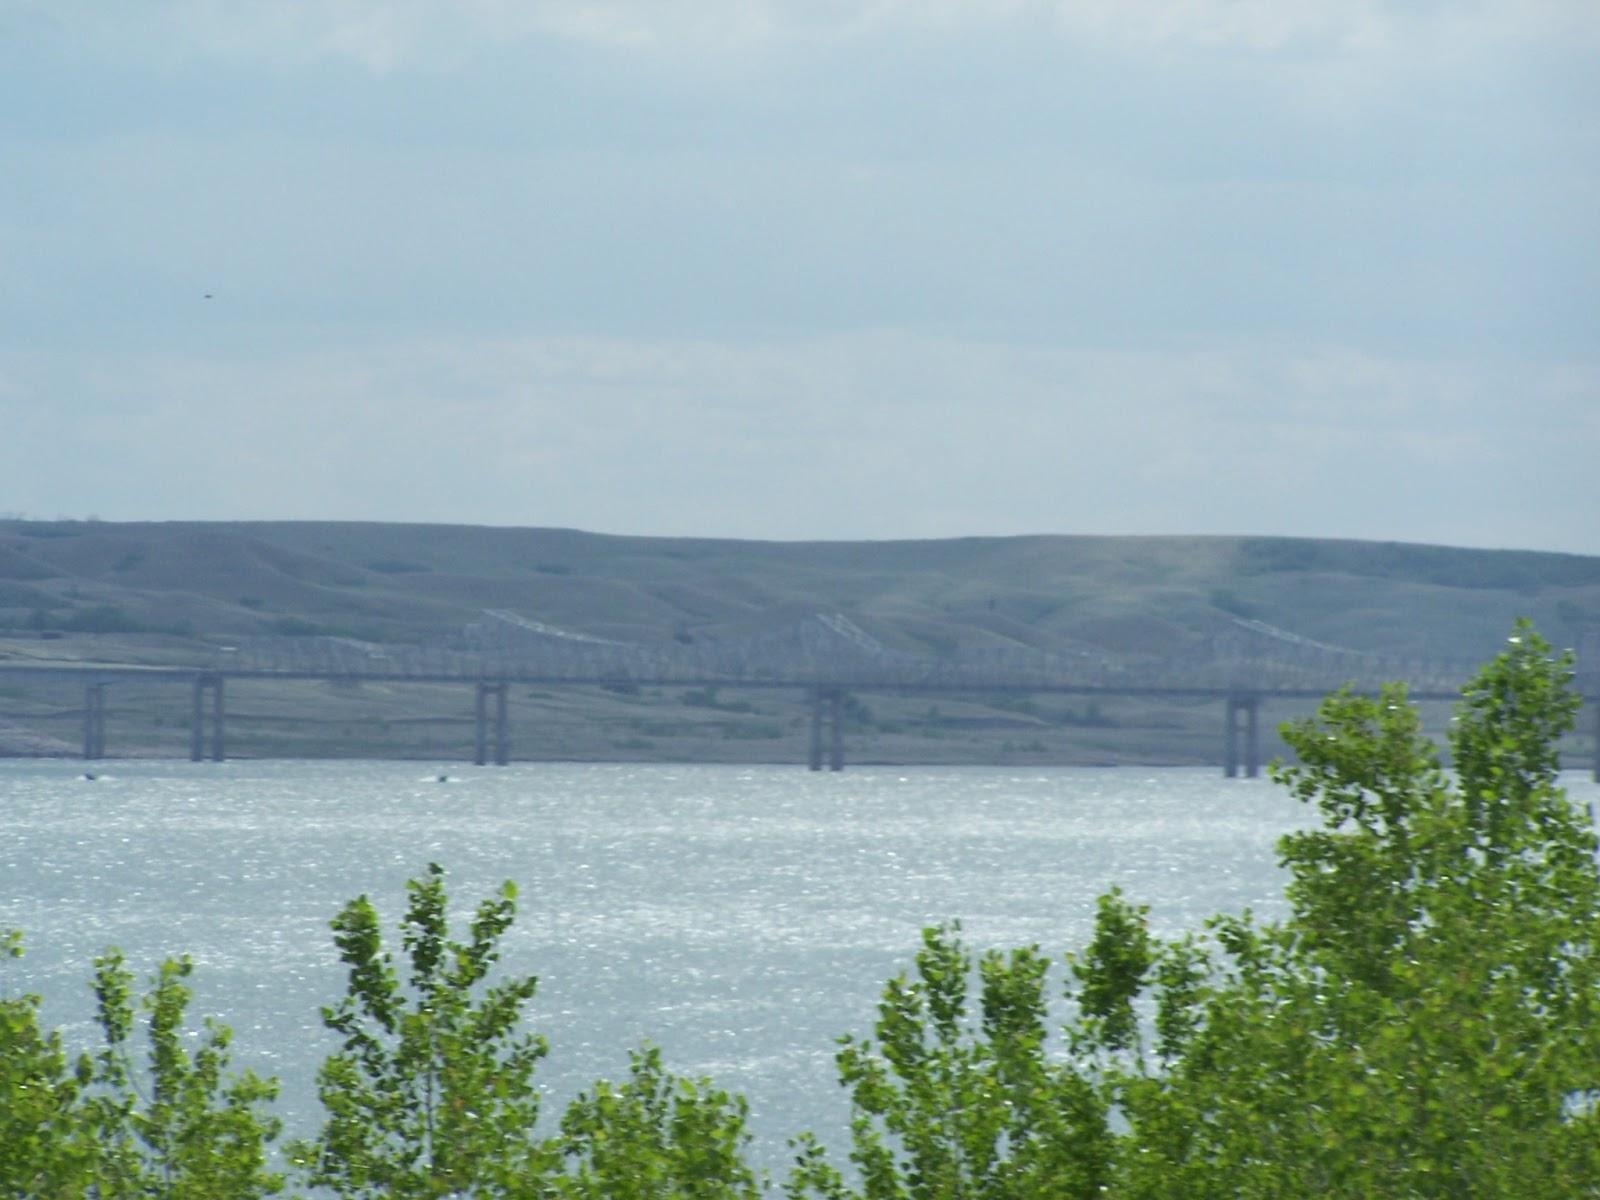 South Dakota Lakes Open Water Fishing For Walleye On Lake